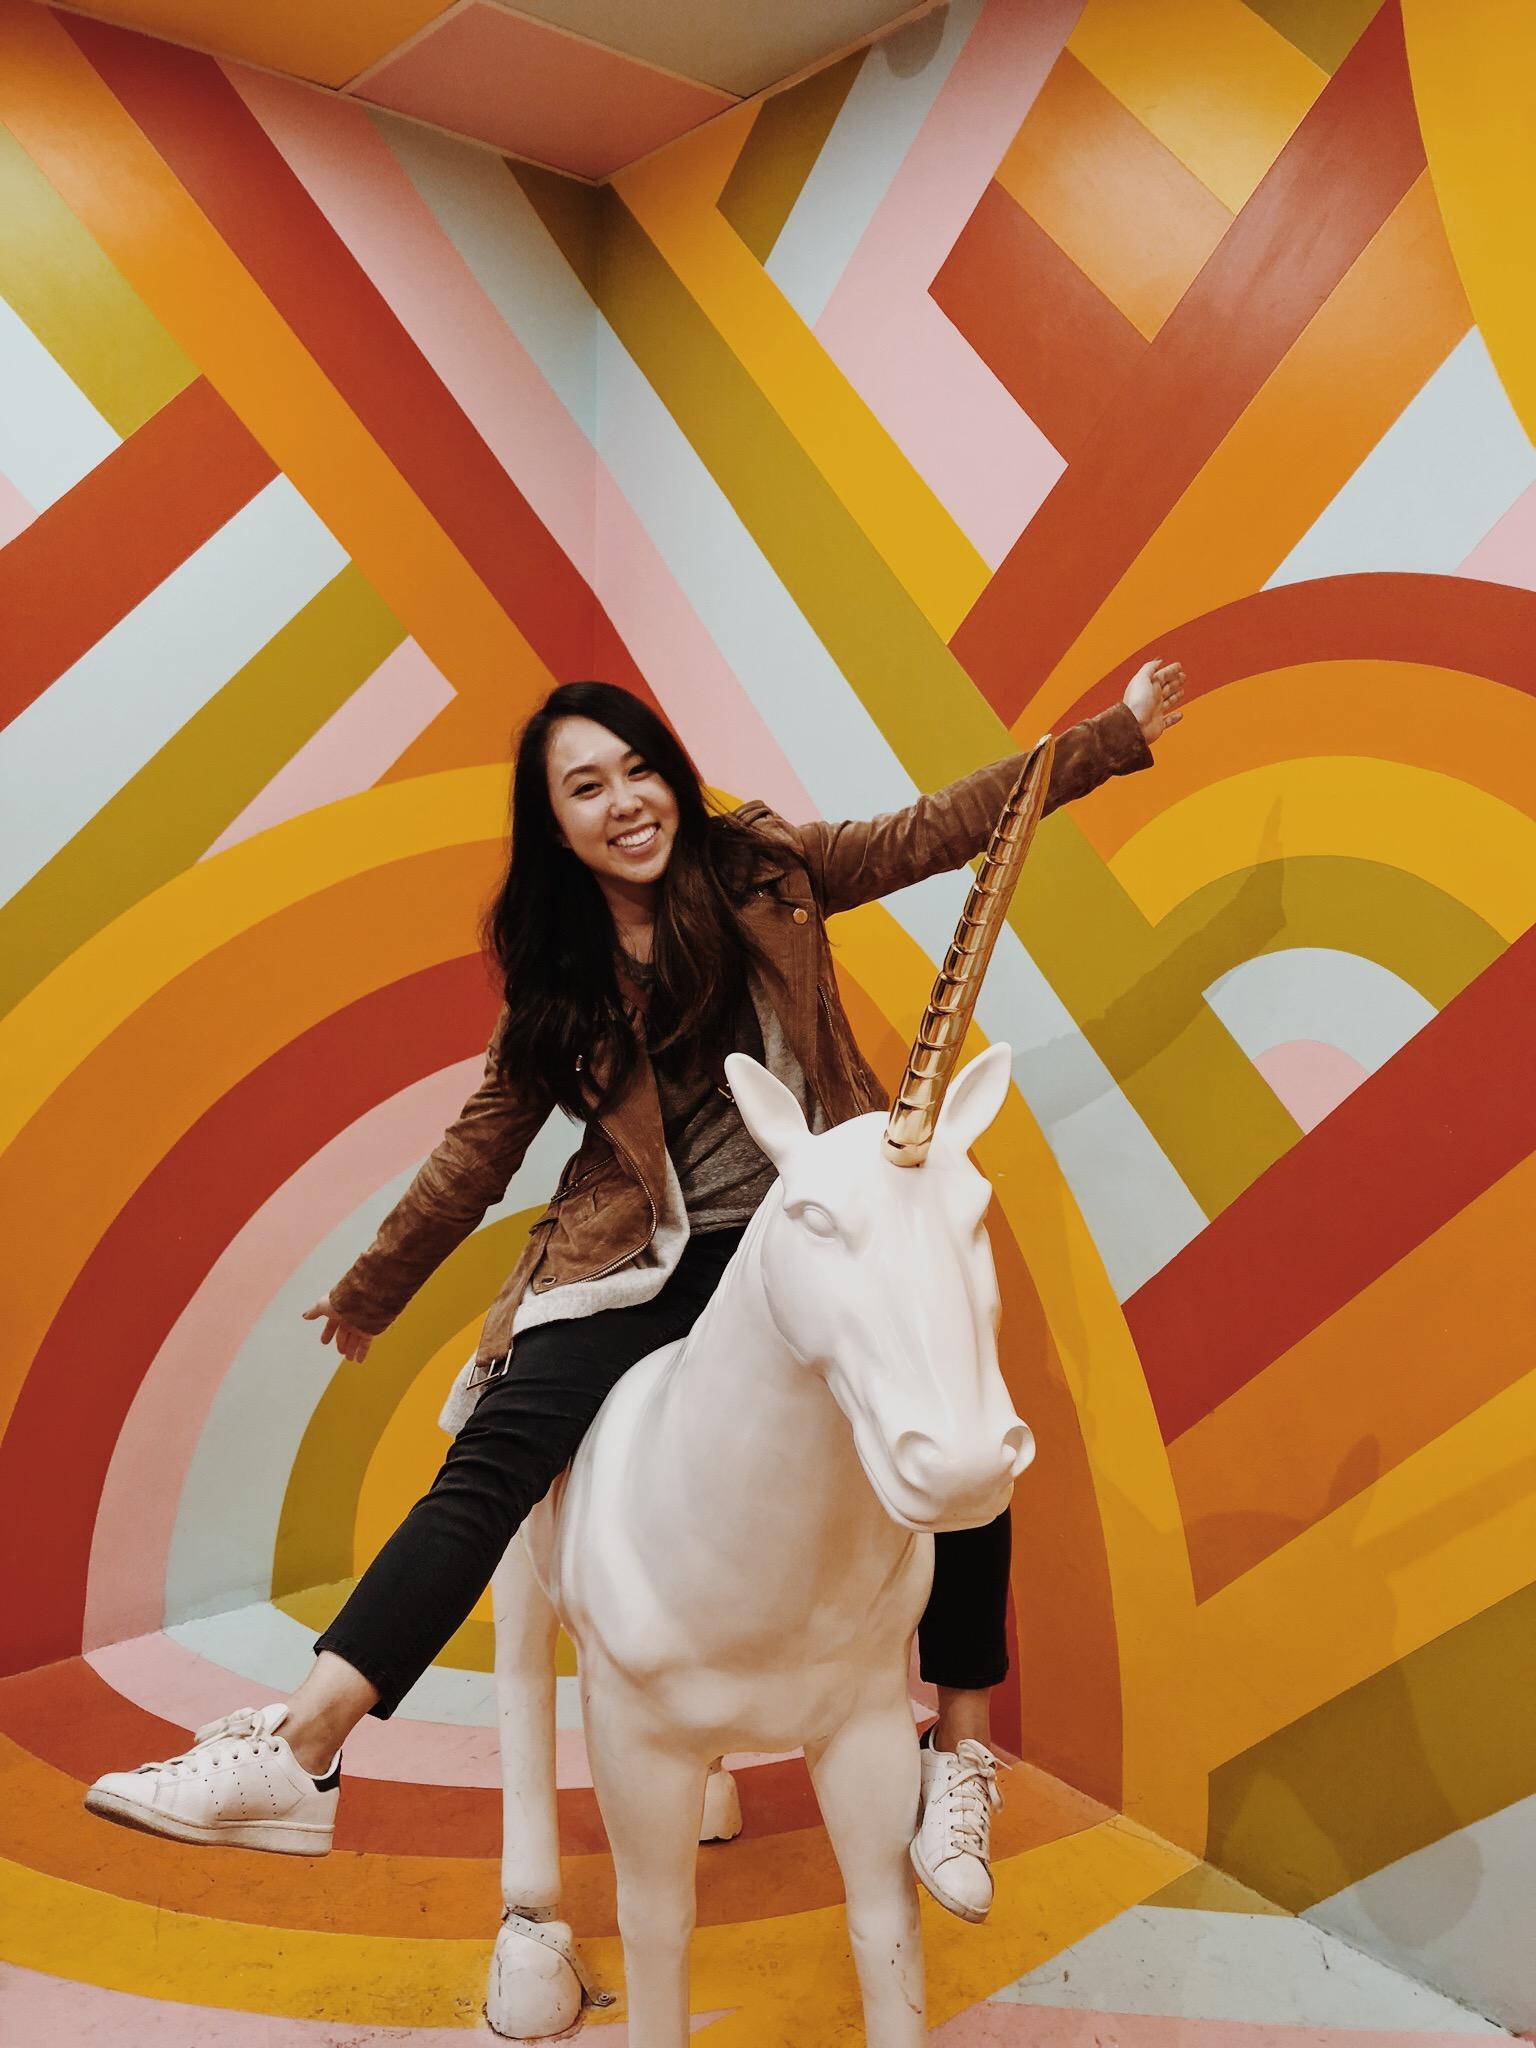 Museum of Ice Cream Milennial Pink Rainbow Room Unicorn